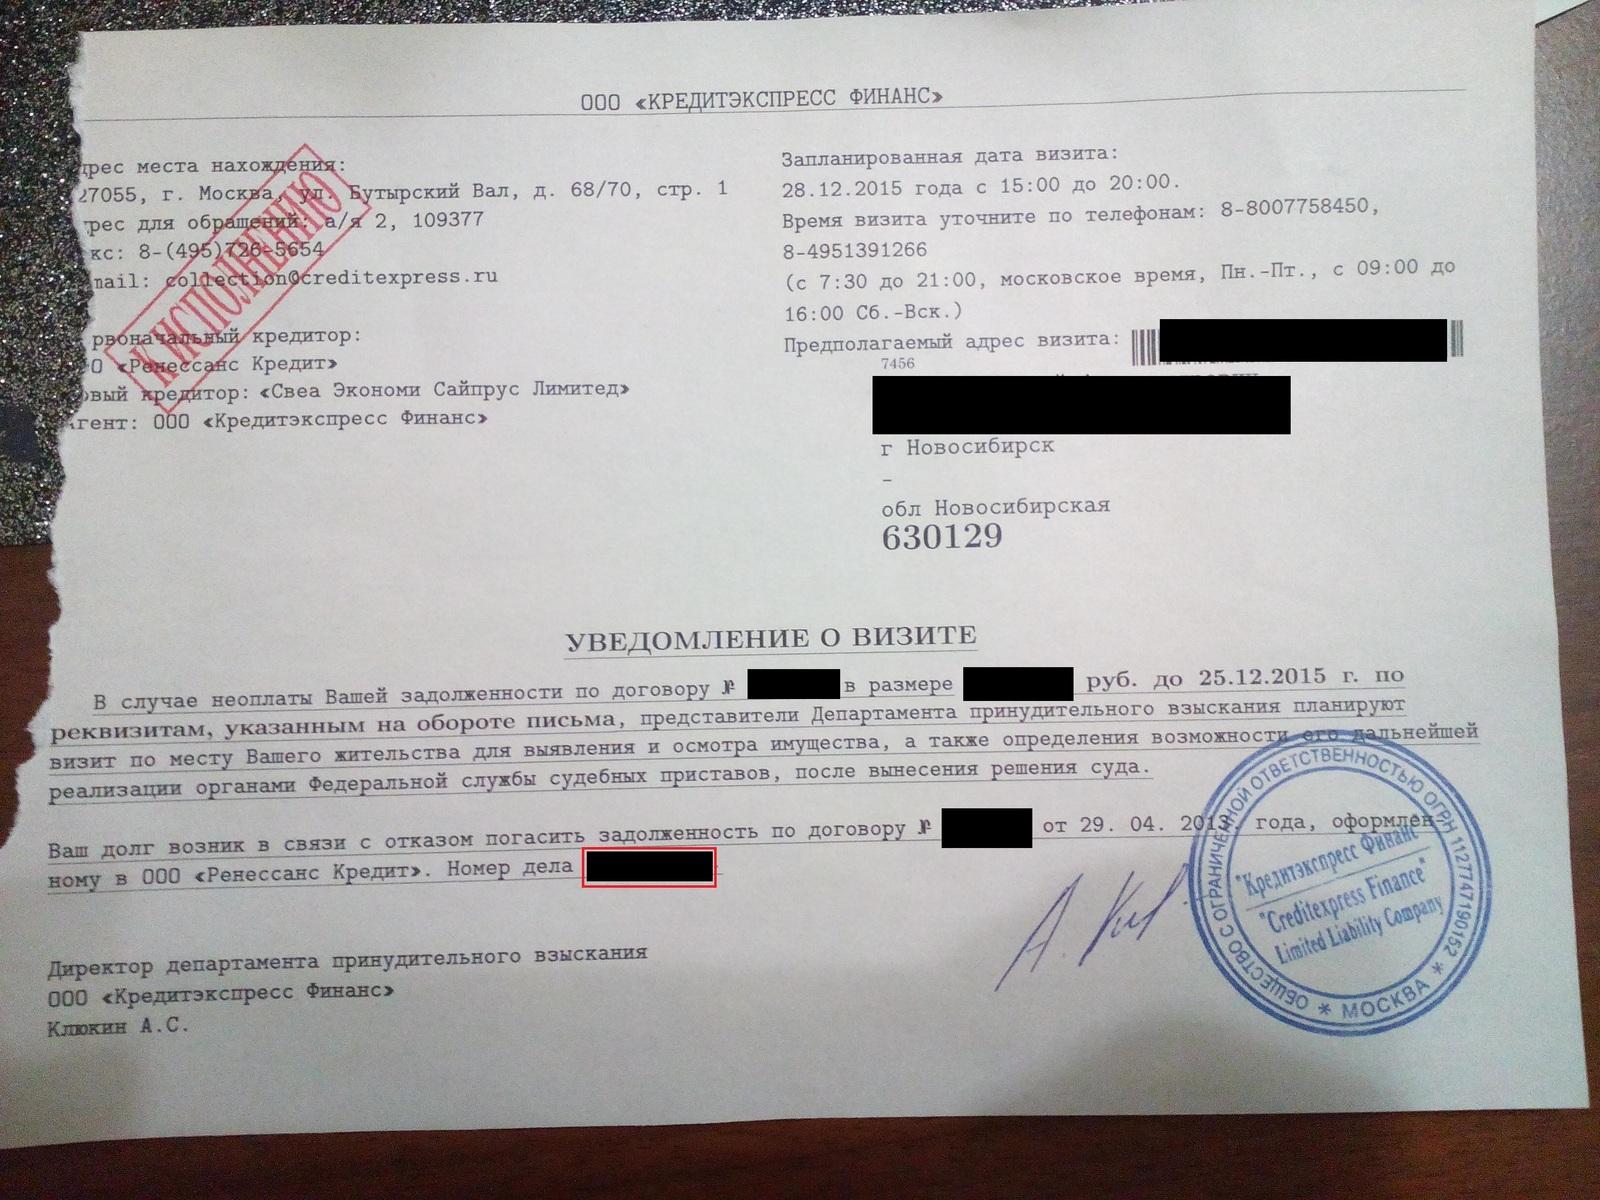 pro100banki ru займ без отказа